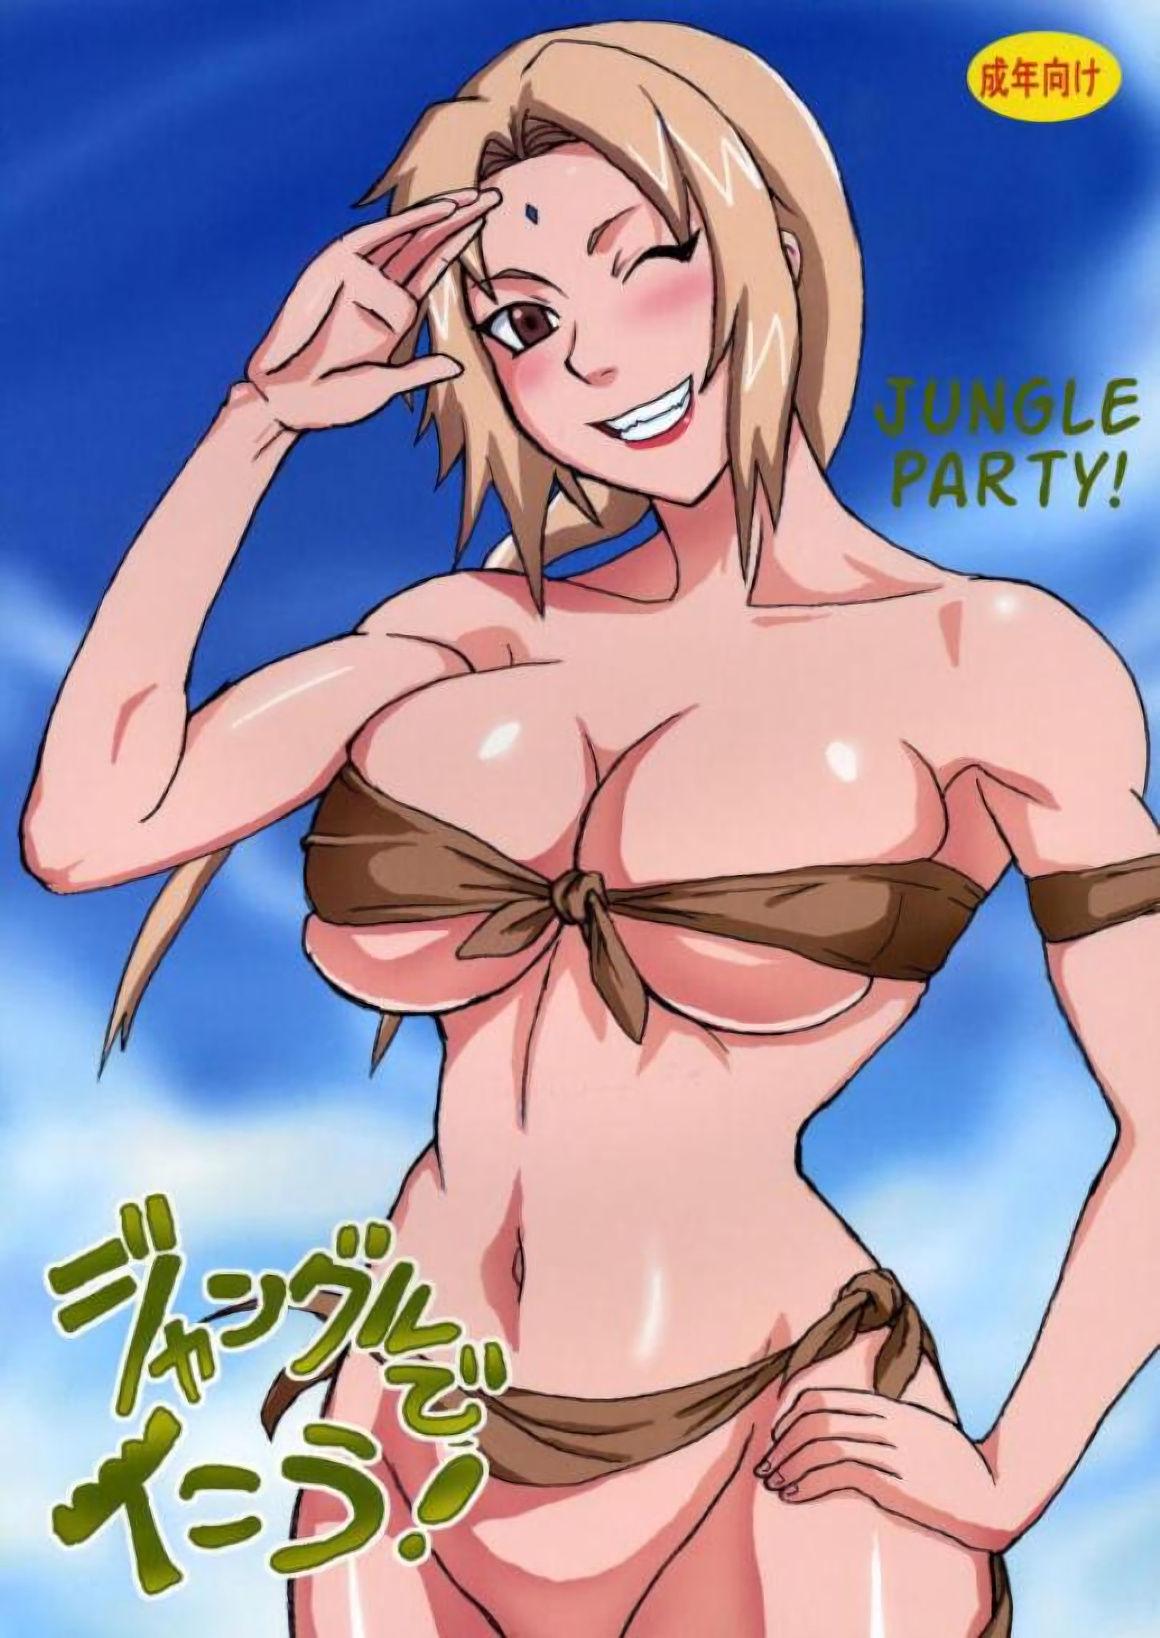 Jungle party hentai manga picture 1